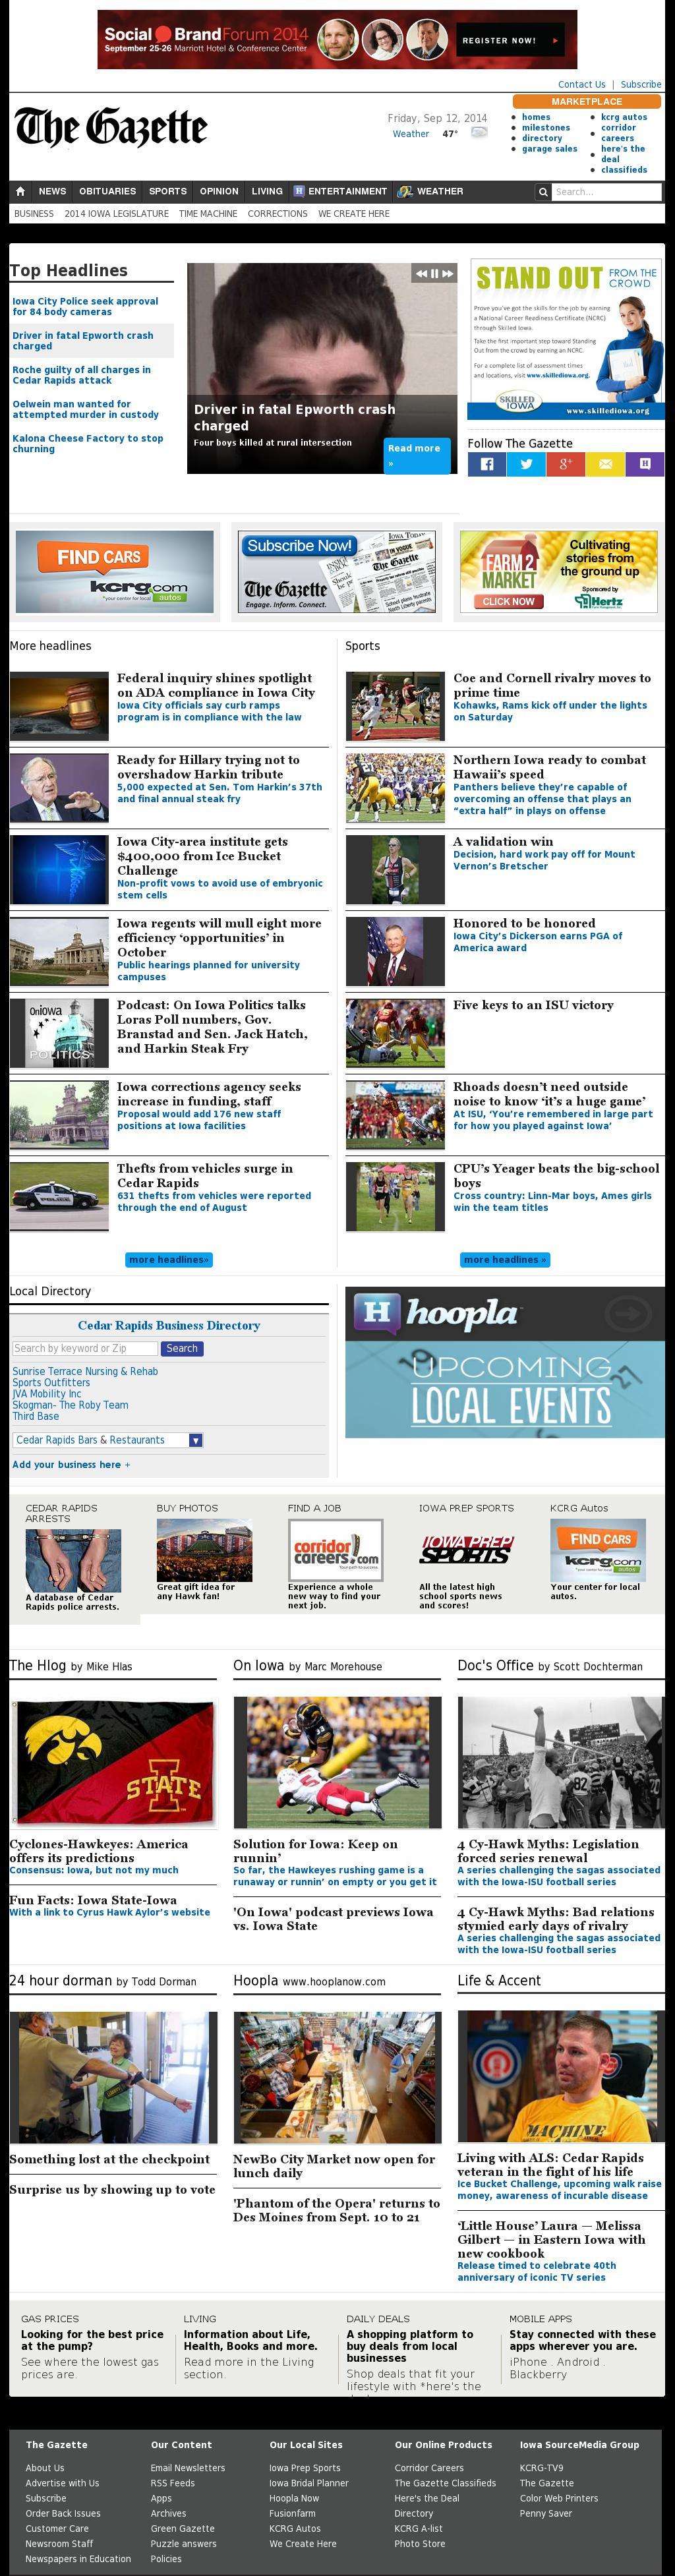 The (Cedar Rapids) Gazette at Saturday Sept. 13, 2014, 2:08 a.m. UTC